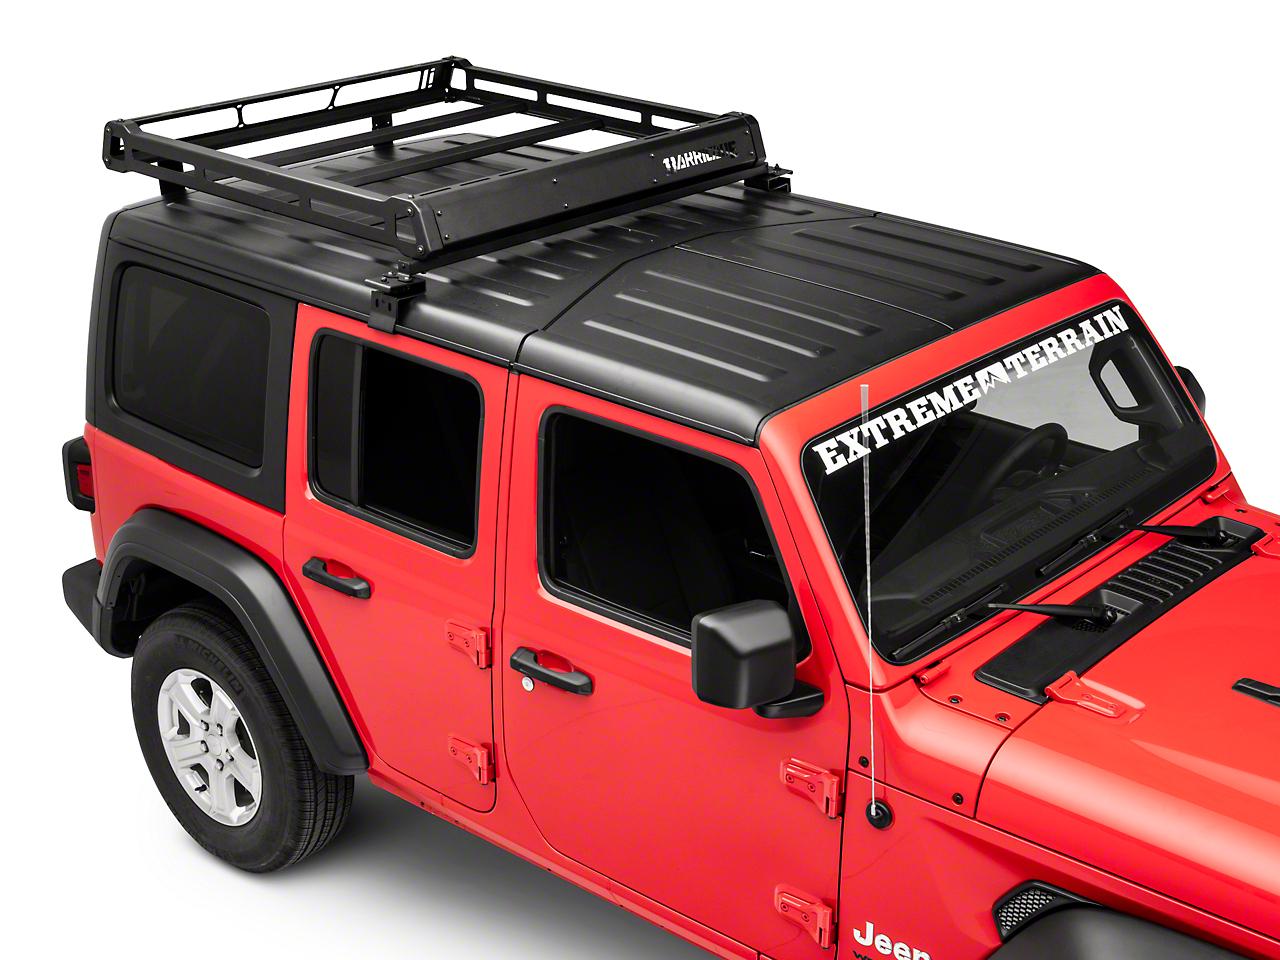 Barricade Removeable Hard Top Roof Basket for OEM Hard Top (2018 Jeep Wrangler JL 4 Door)